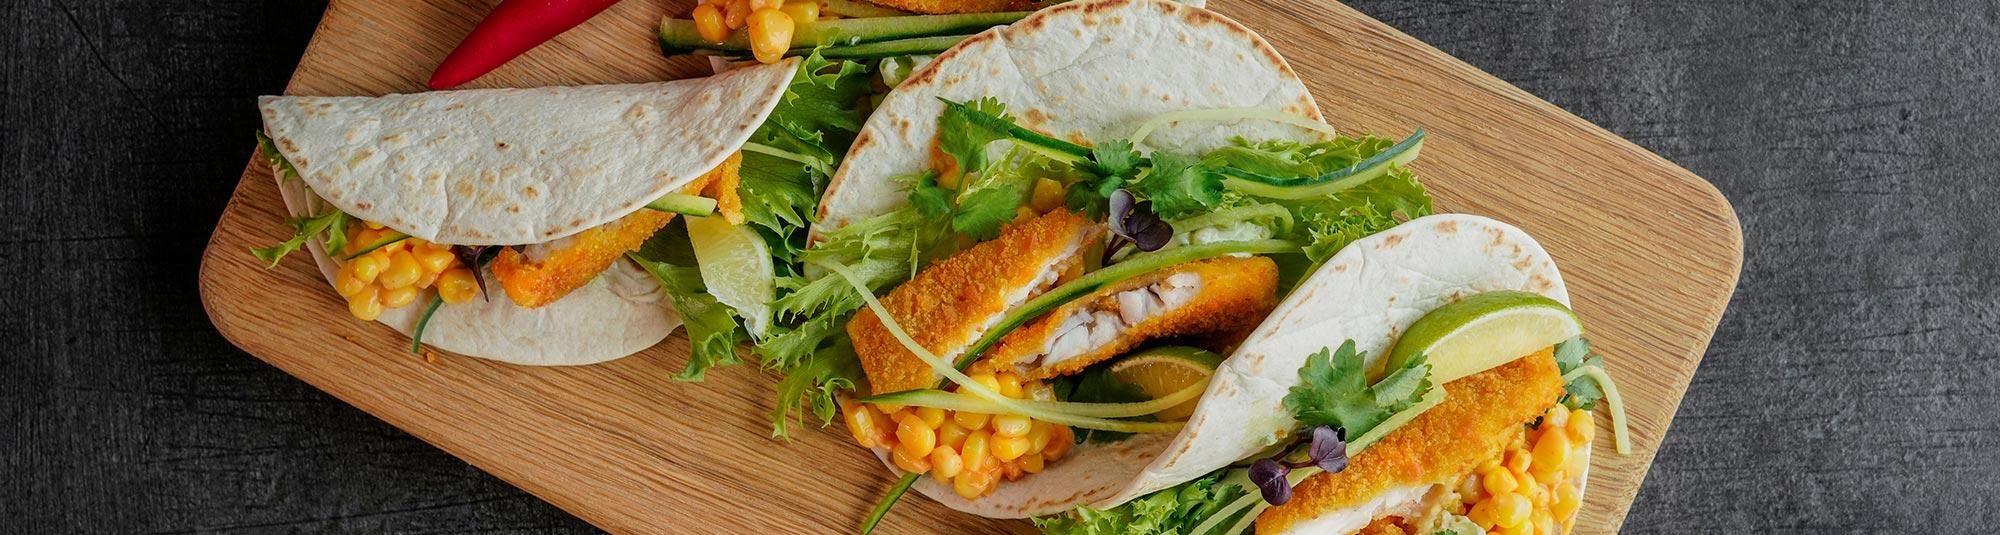 Tortillalefser fylt med fiskepinner, maisrøre og salat